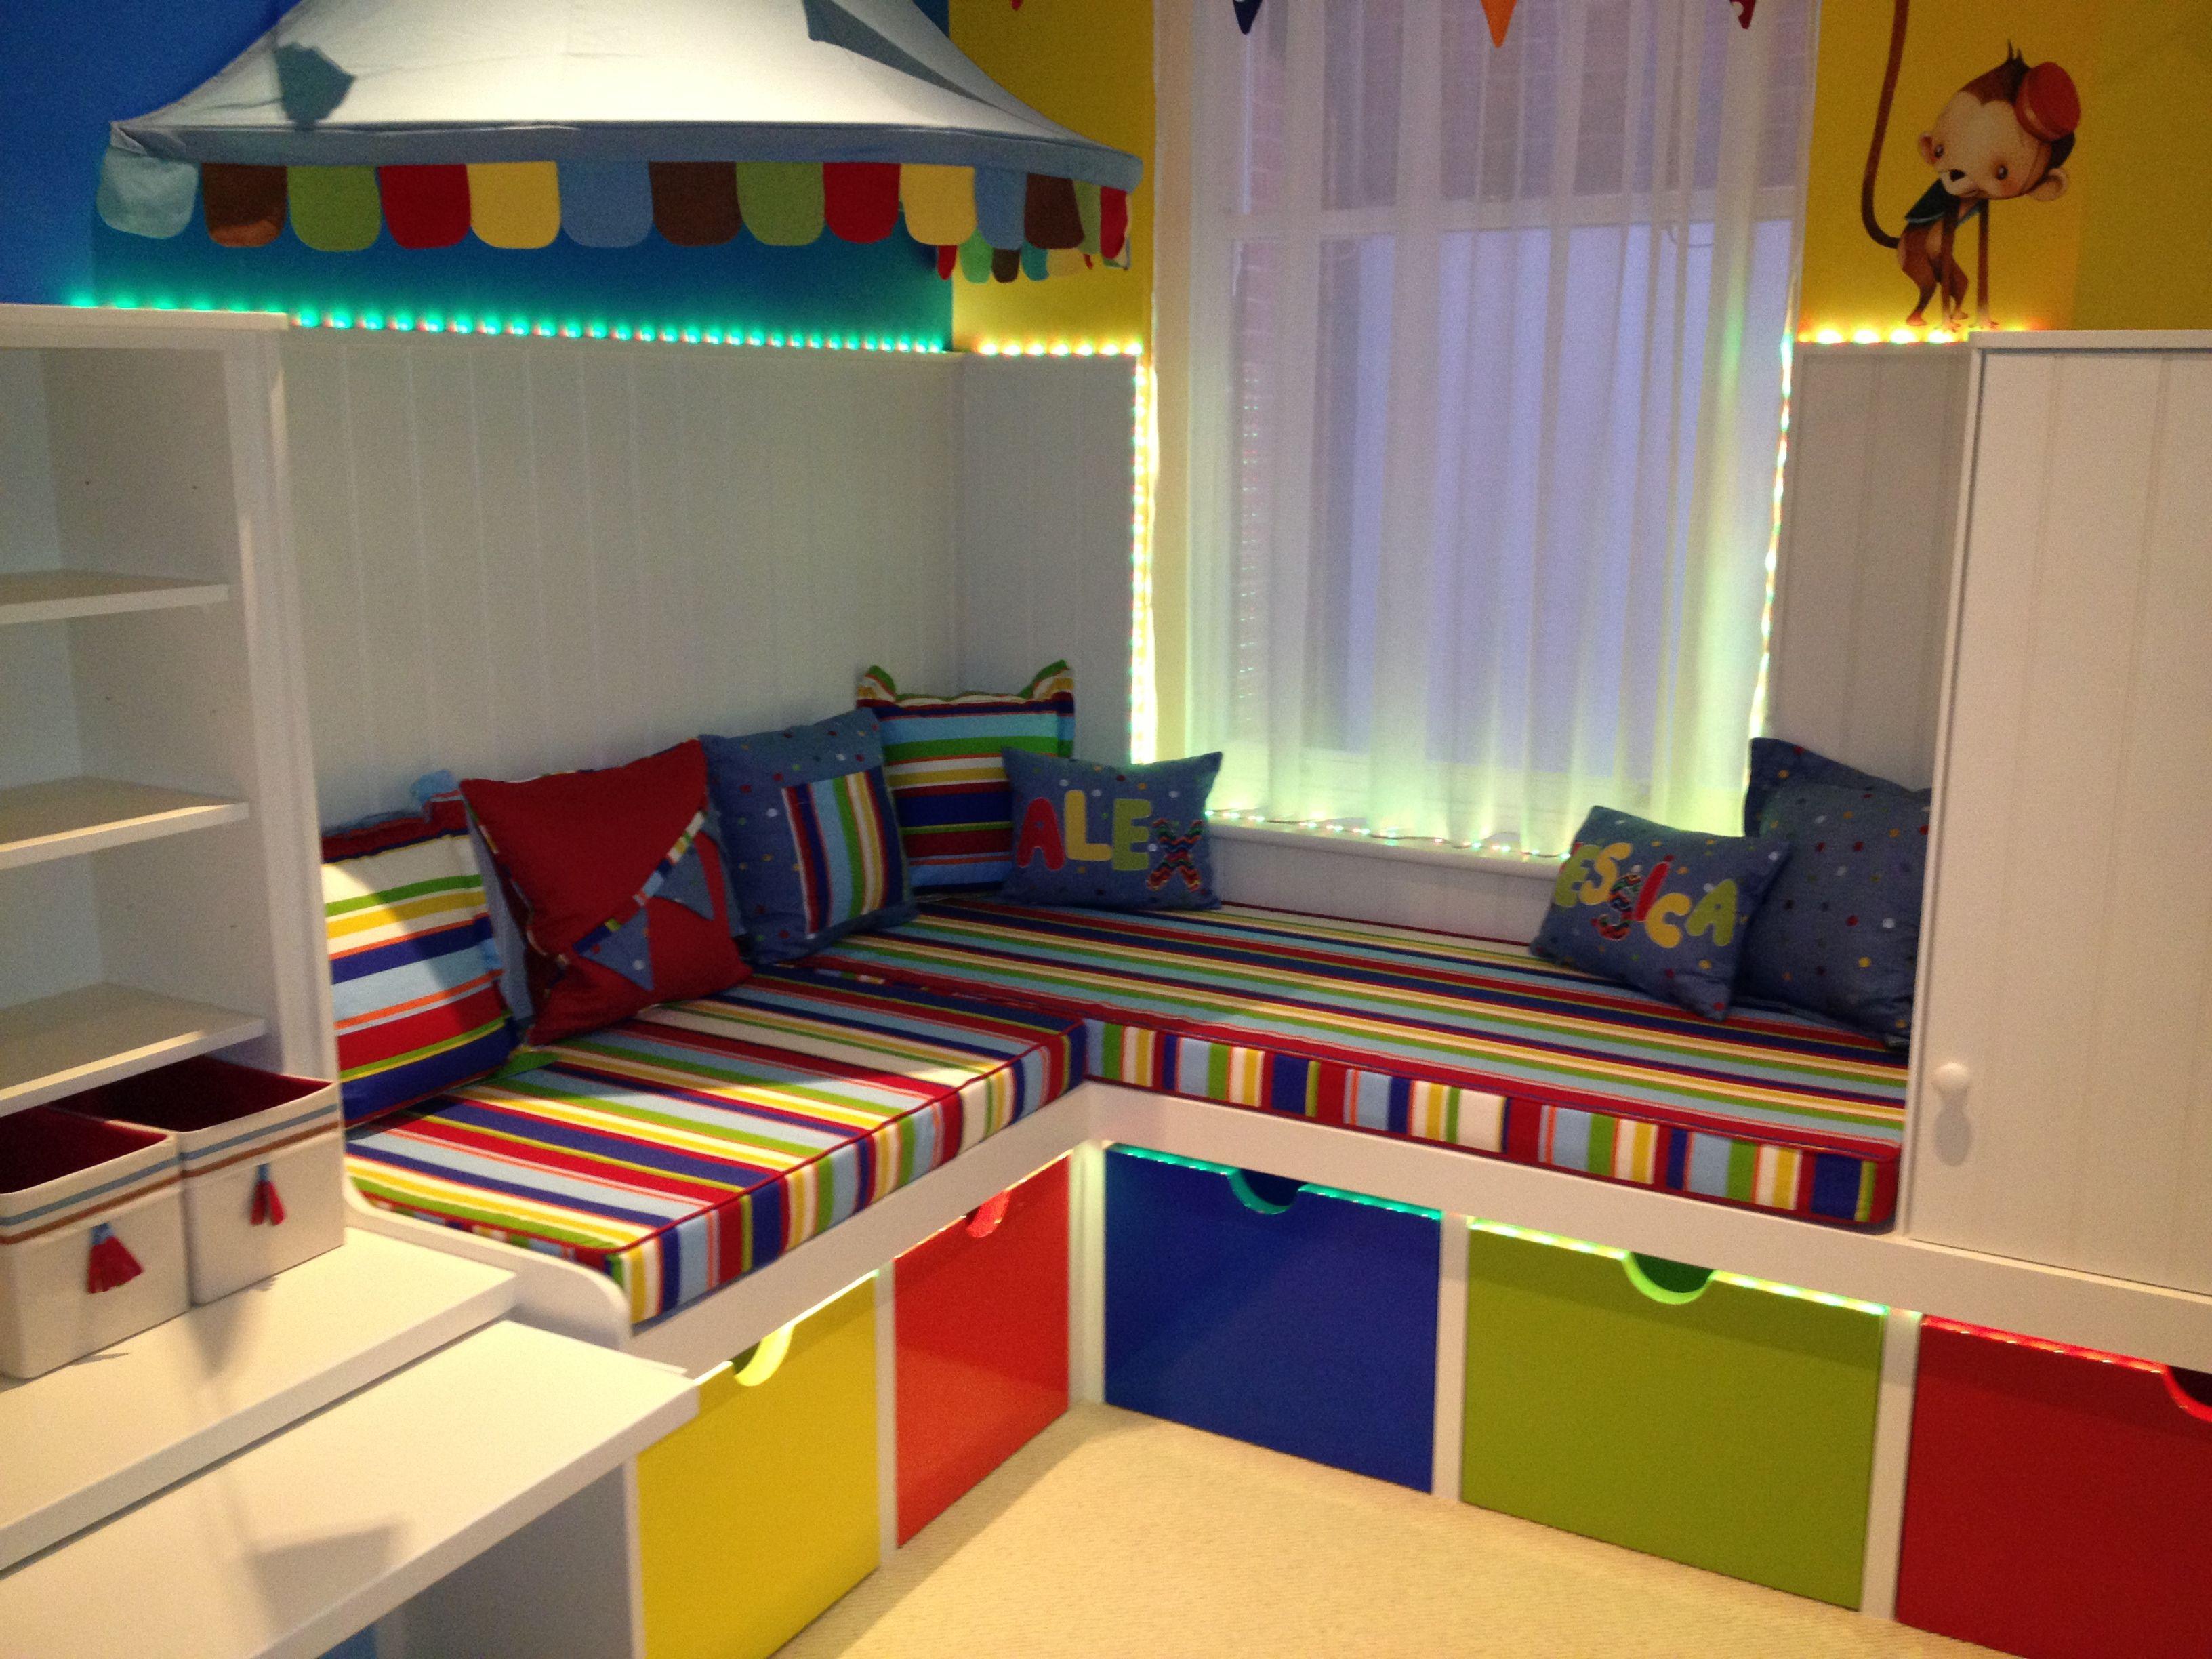 Ordinaire Interior Design, Cheerful Kids Playroom Ideas In Colourful Decoration  Playroom London Austin John Interiors Ideas Kids Playroom.